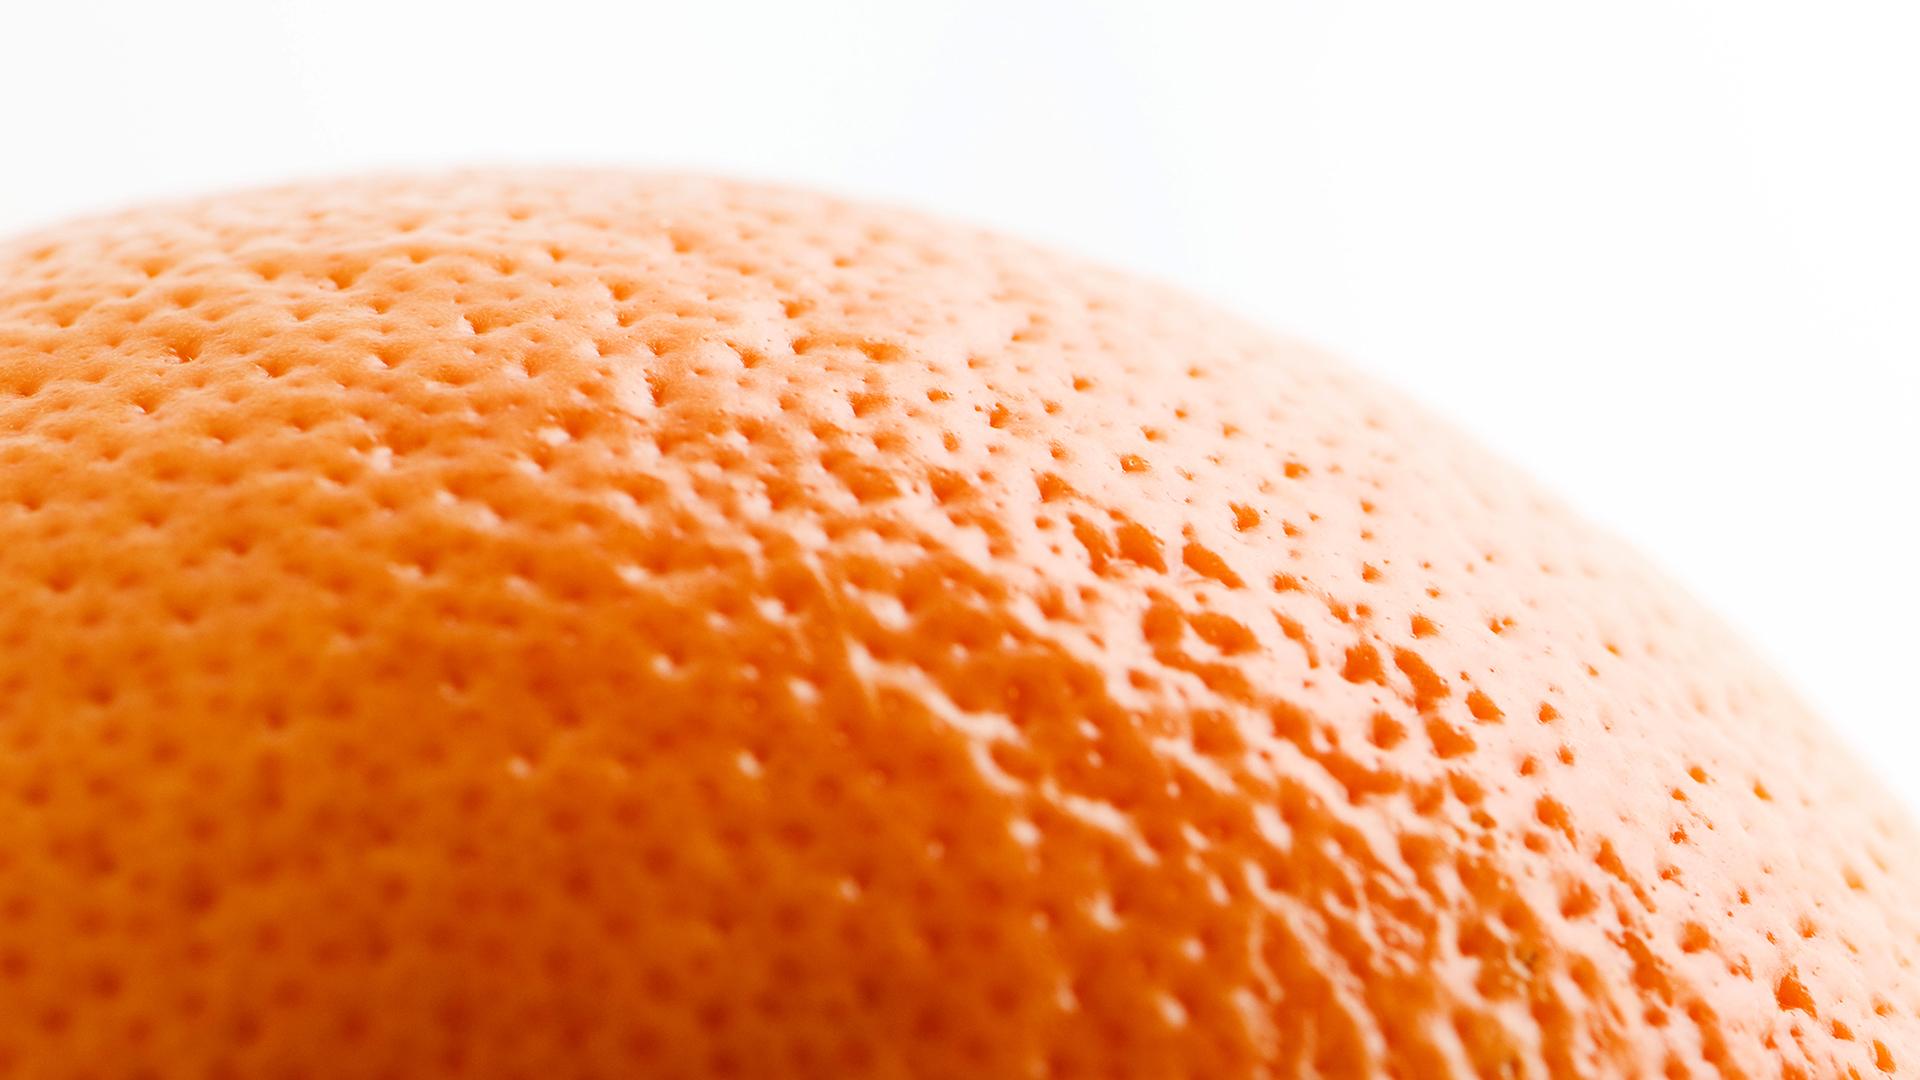 Orange peel skin: How to treat it, avoid it